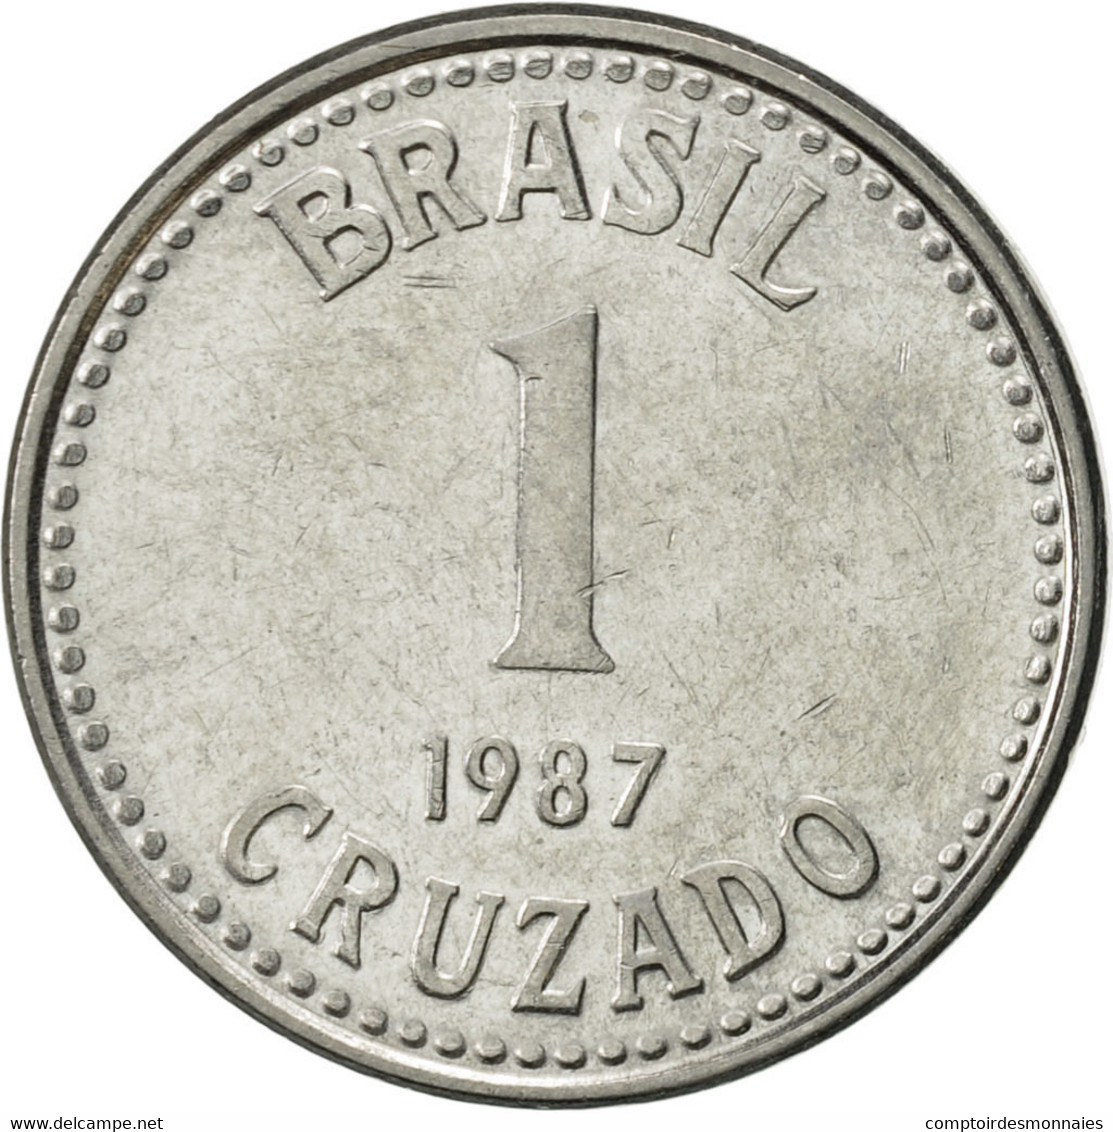 Brésil, Cruzado, 1987, SUP, Stainless Steel, KM:605 - Brésil